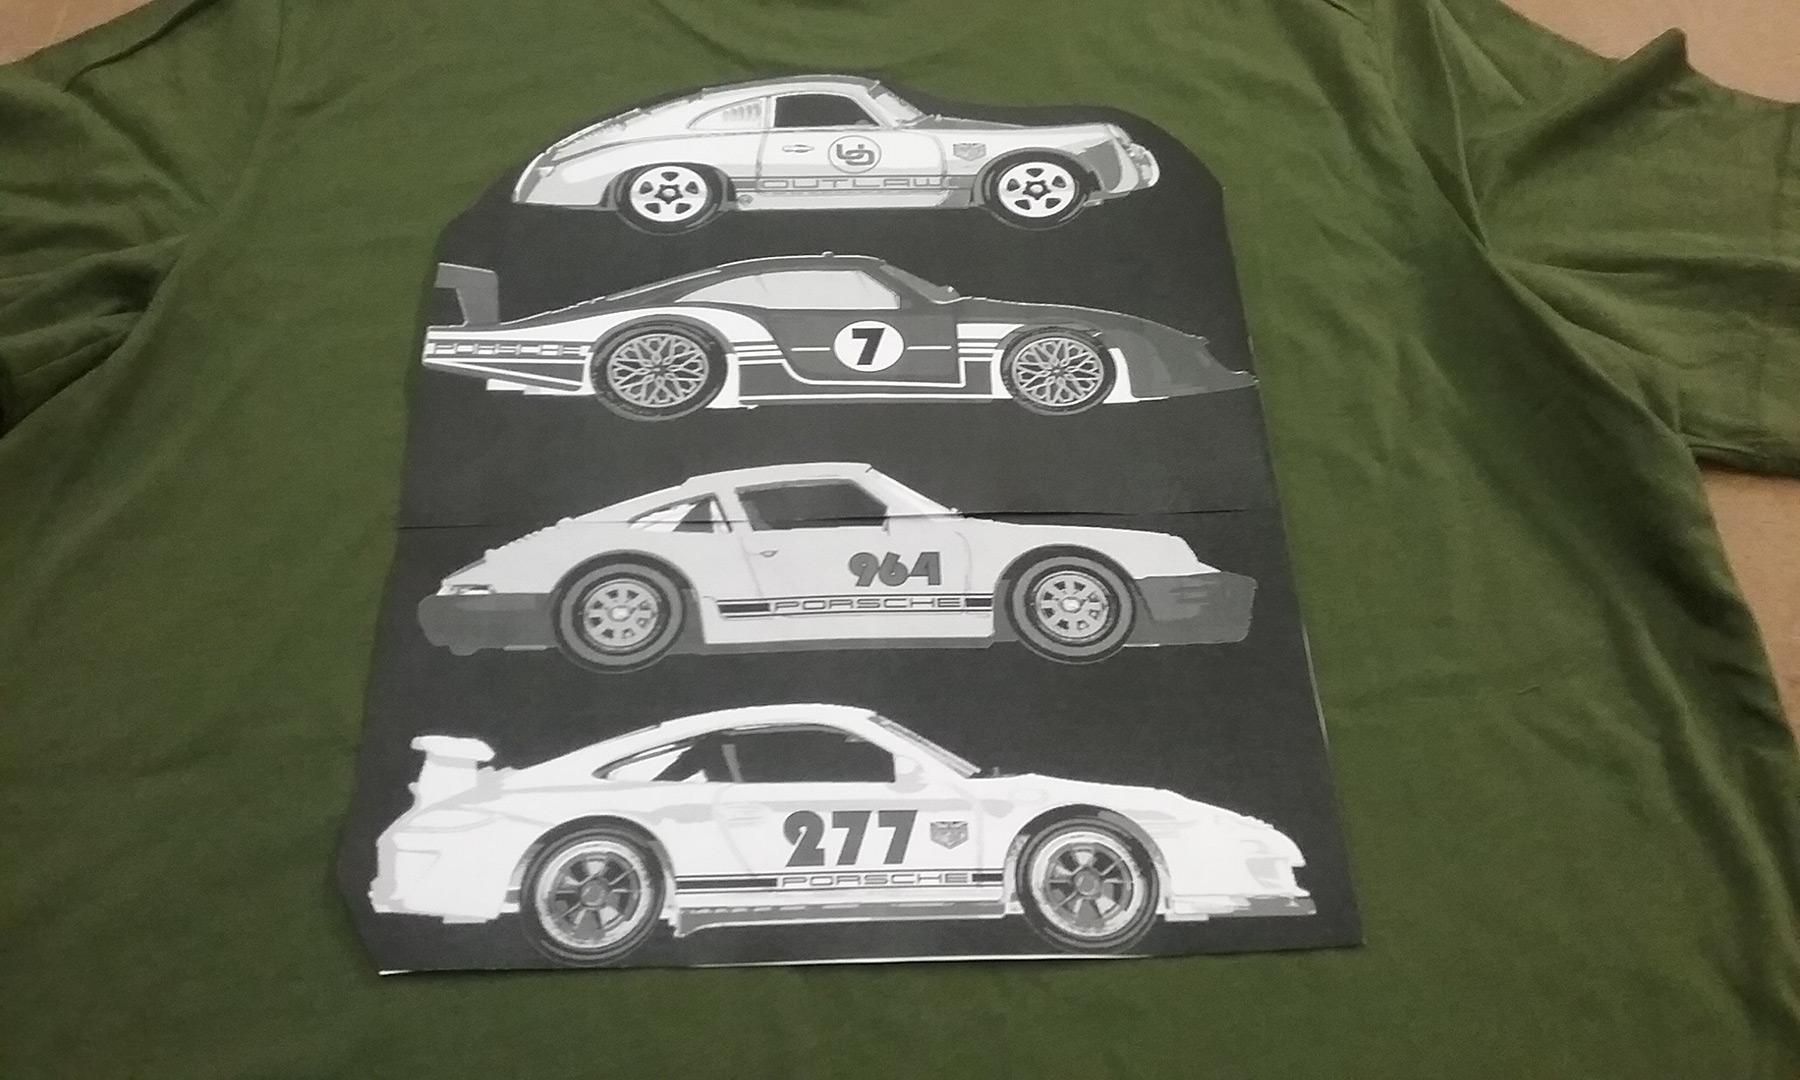 Hotwheels T-shirt mockup for the Long Beach Grand prix event.